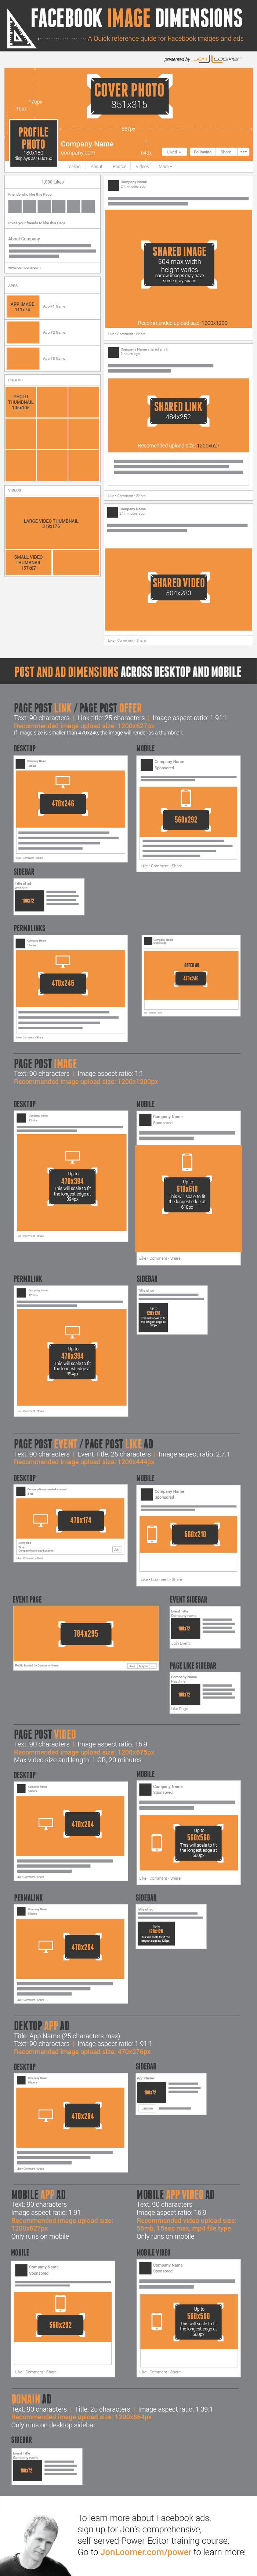 dimensioni elementi grafici facebook